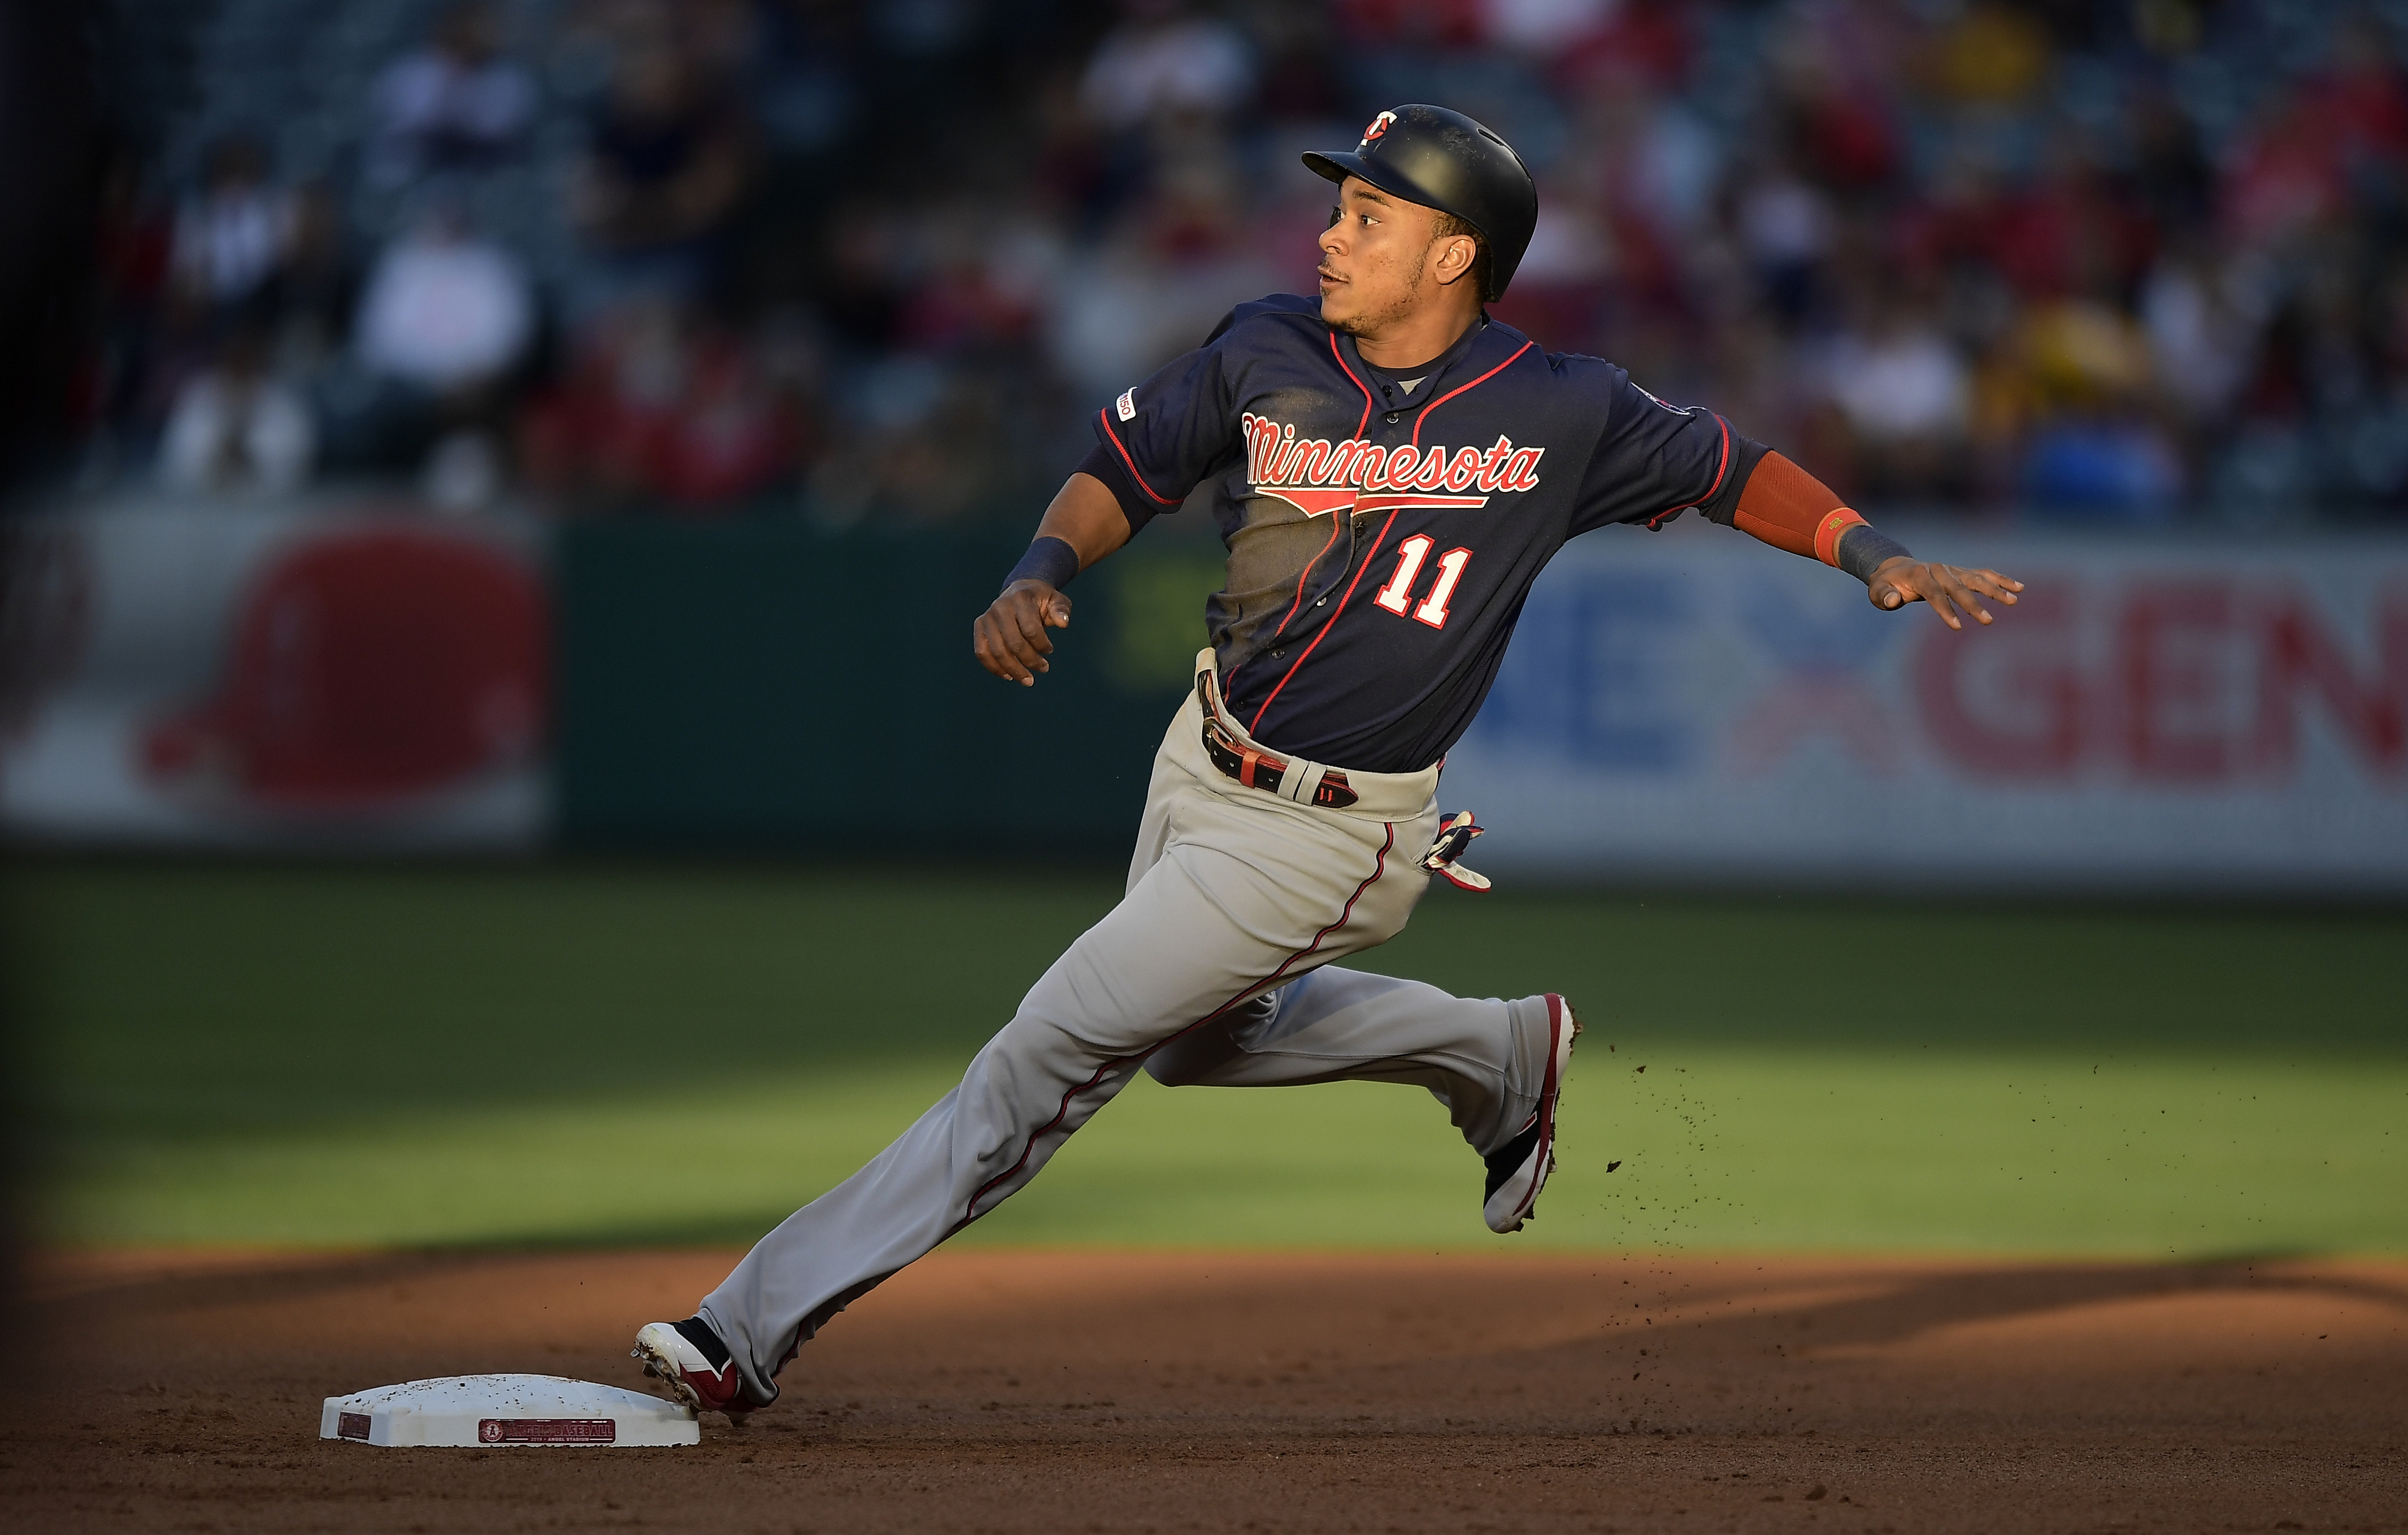 Sano's 2-run homer propels Twins over Angels 3-1